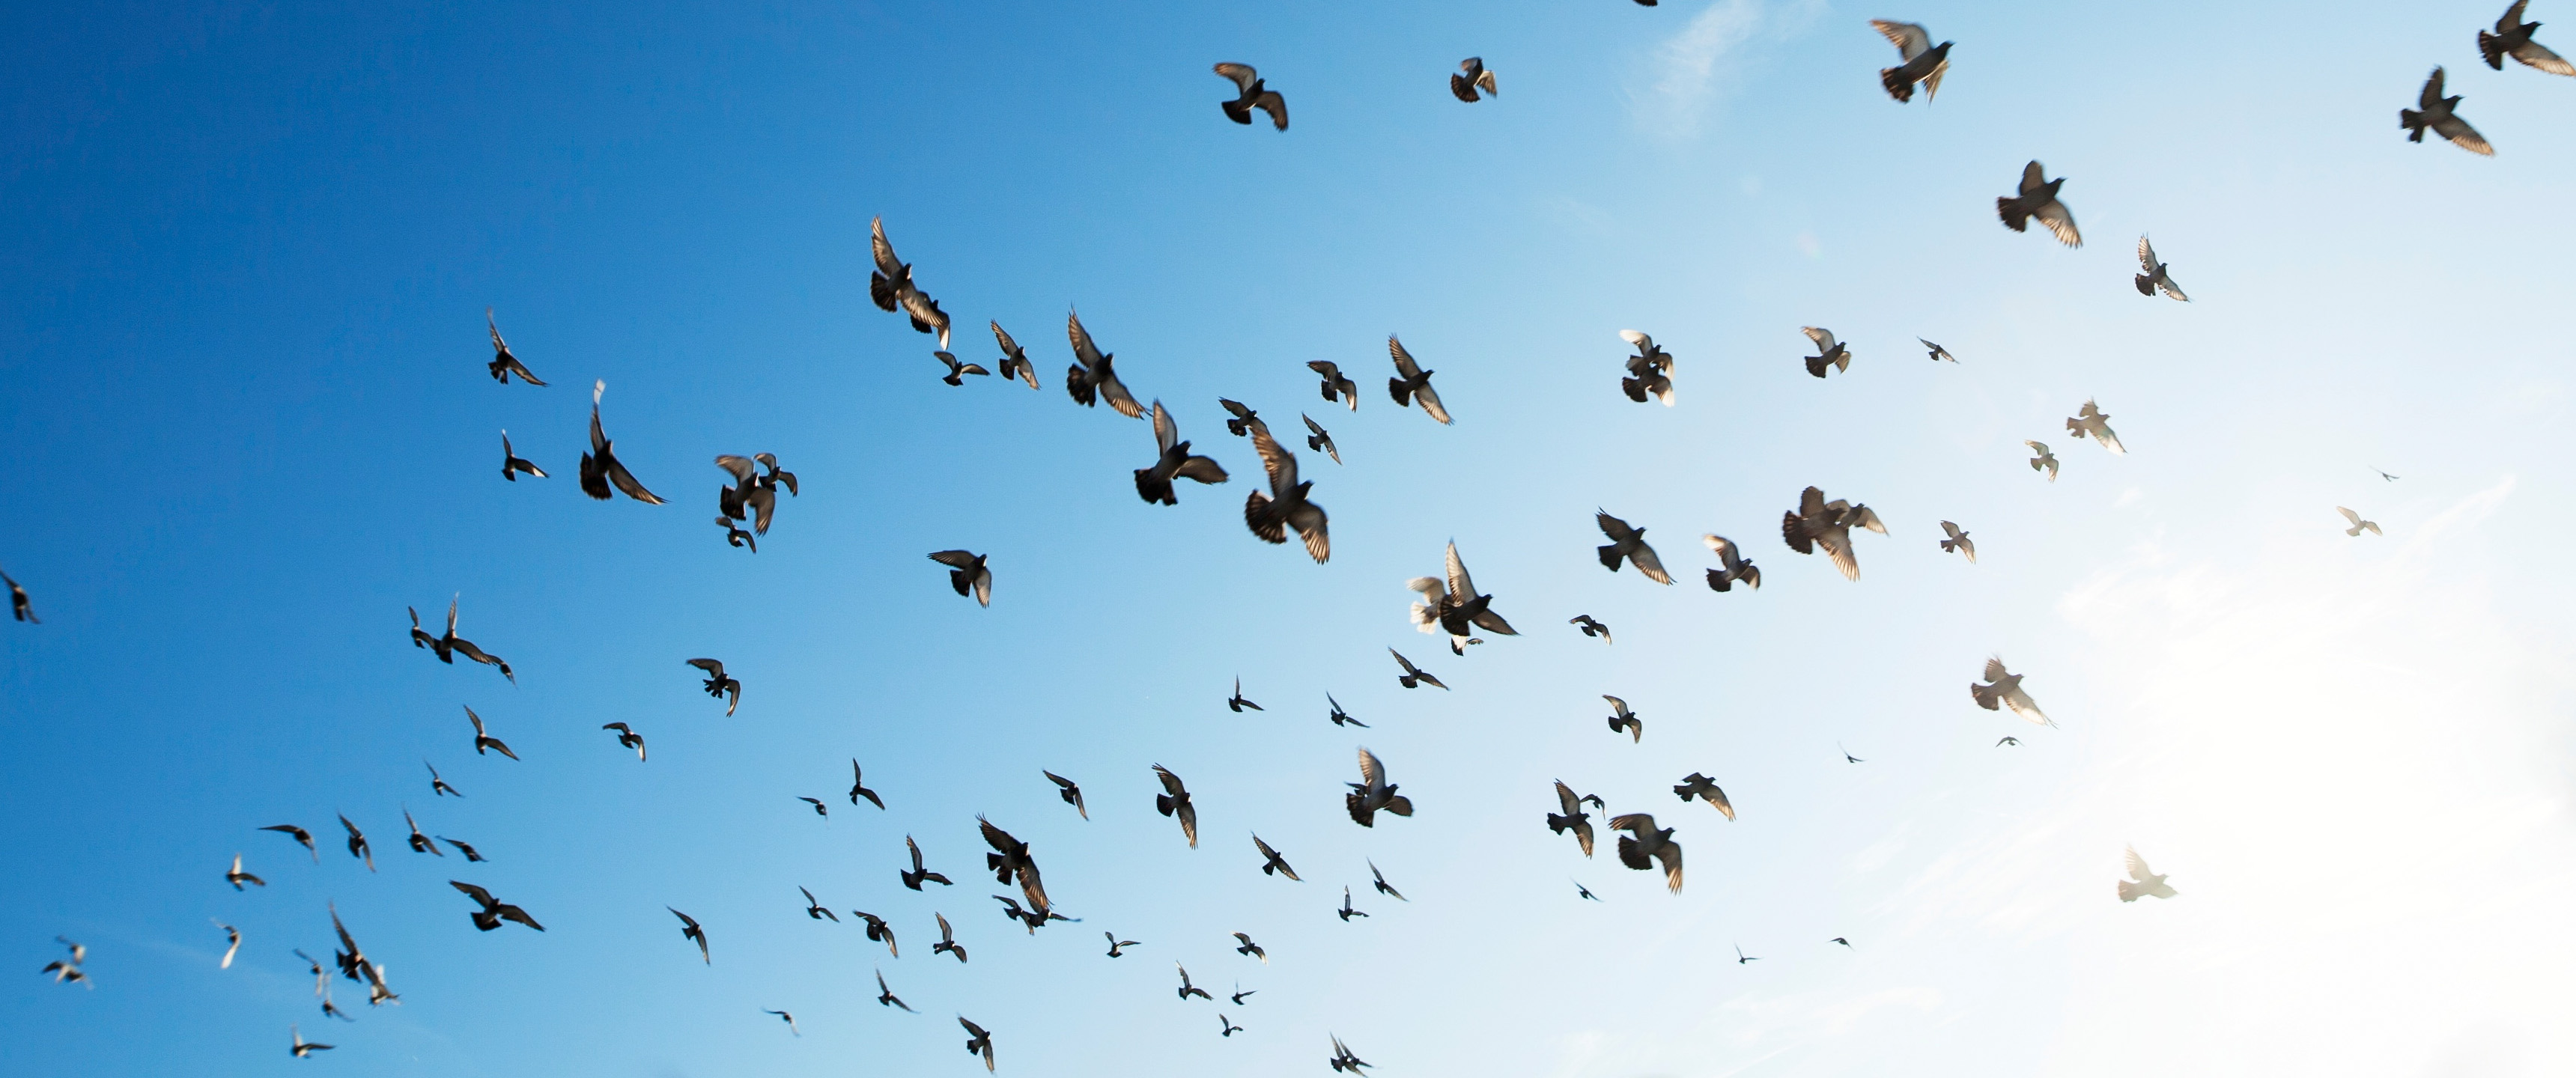 Flock Of Birds 219 Wallpaper Ultrawide Monitor 219 Wallpapers